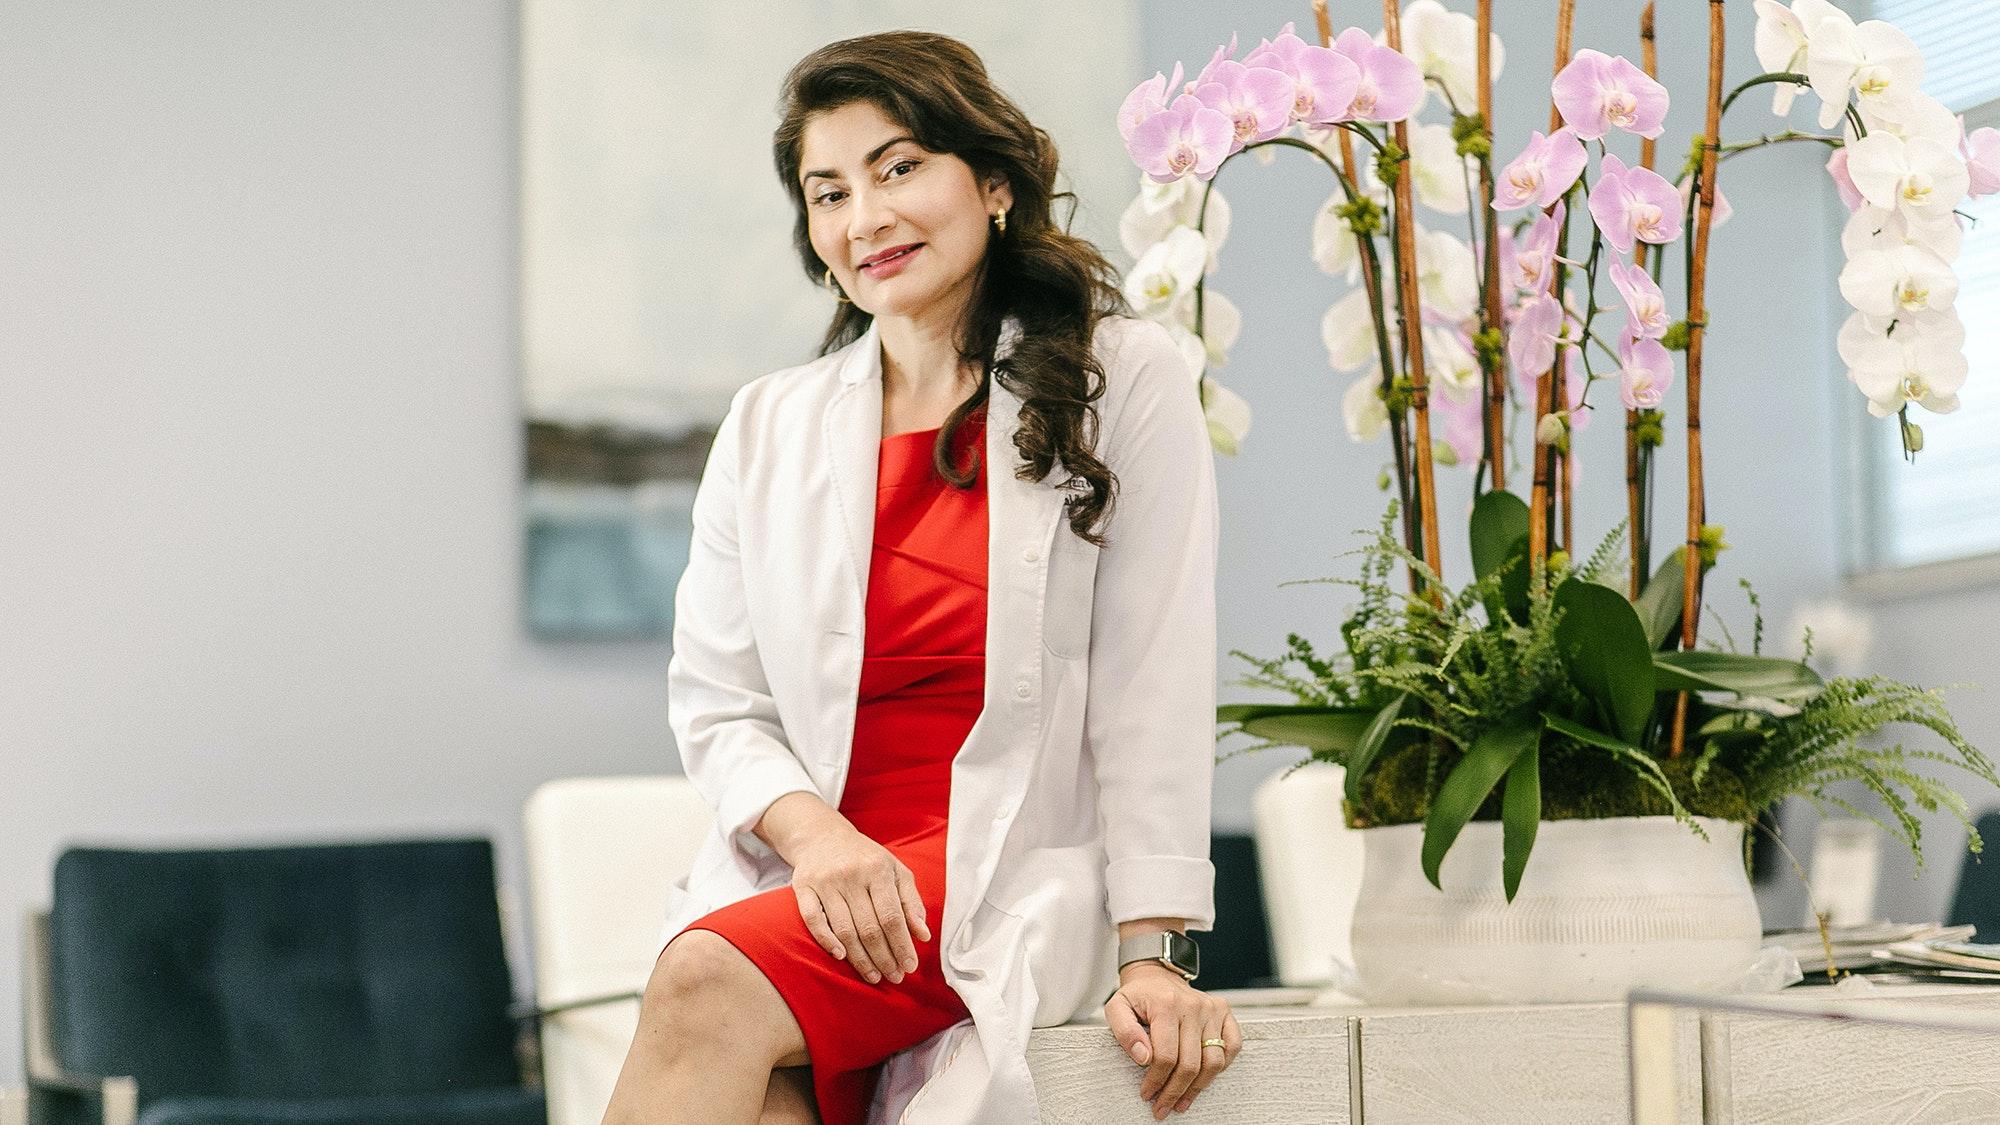 Dr. Kay